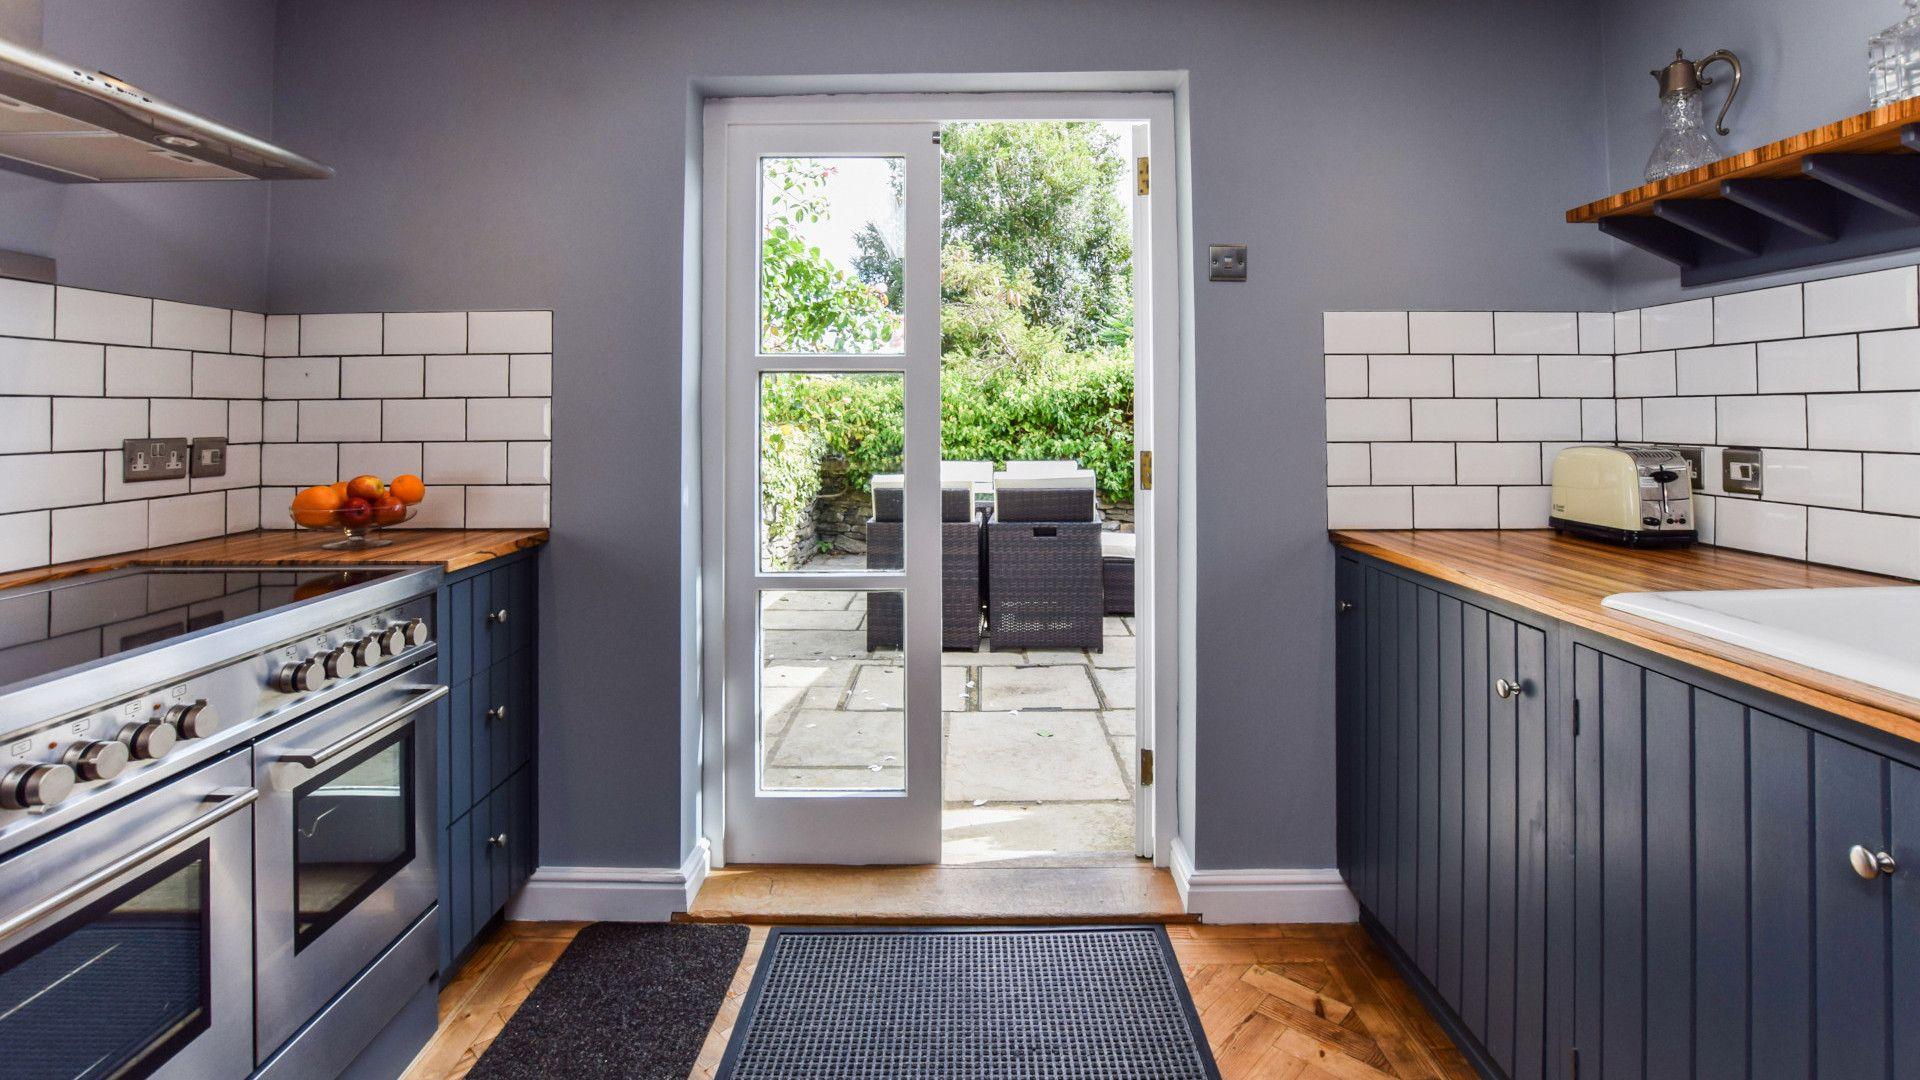 Kitchen leading into patio garden,  27 Horsefair, Bolthole Retreats